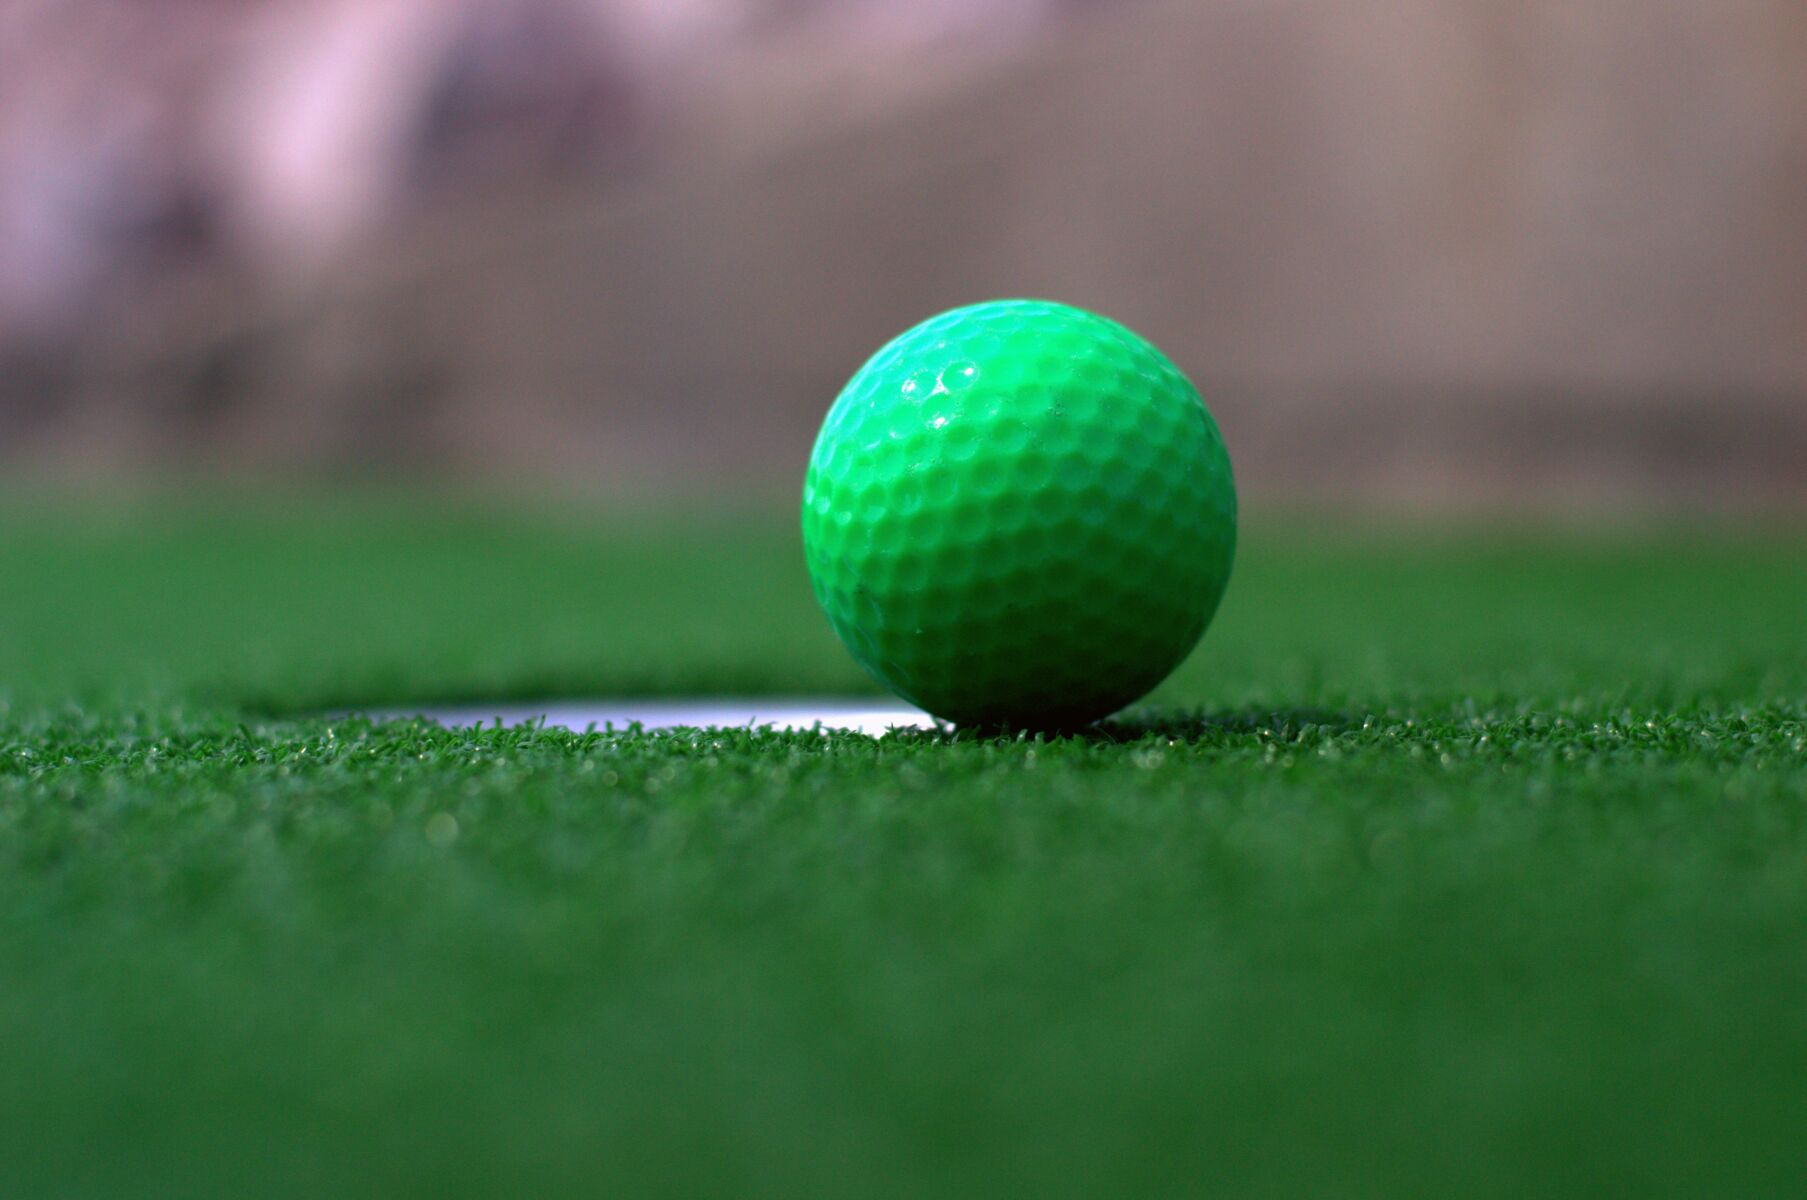 green golf ball by golf hole